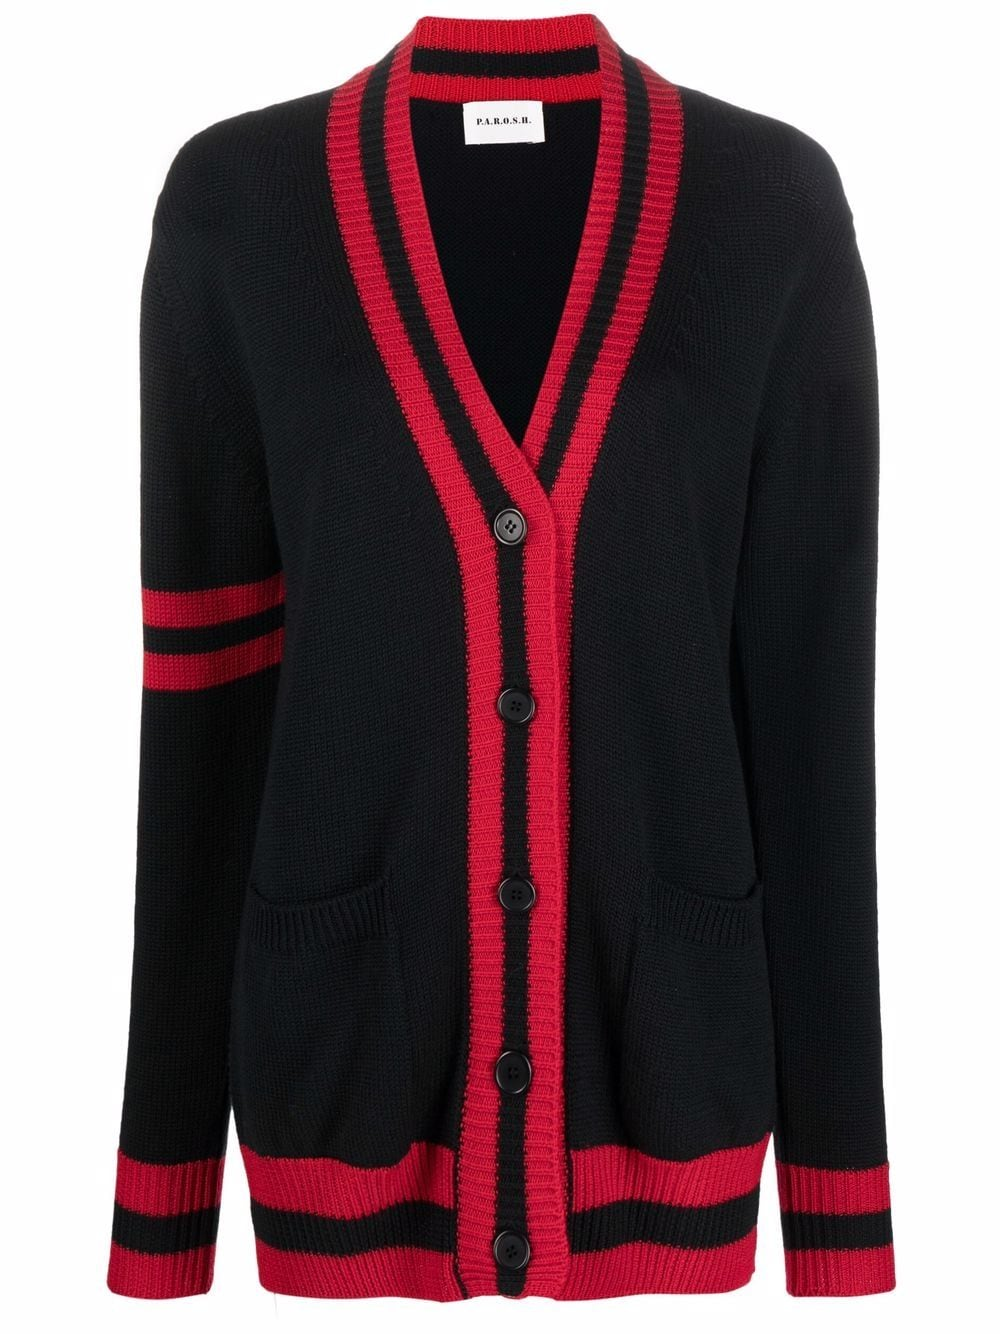 Cardigan in lana rossa e nera con finiture a contrasto P.A.R.O.S.H. | Cardigan | D520082-LAMAR809